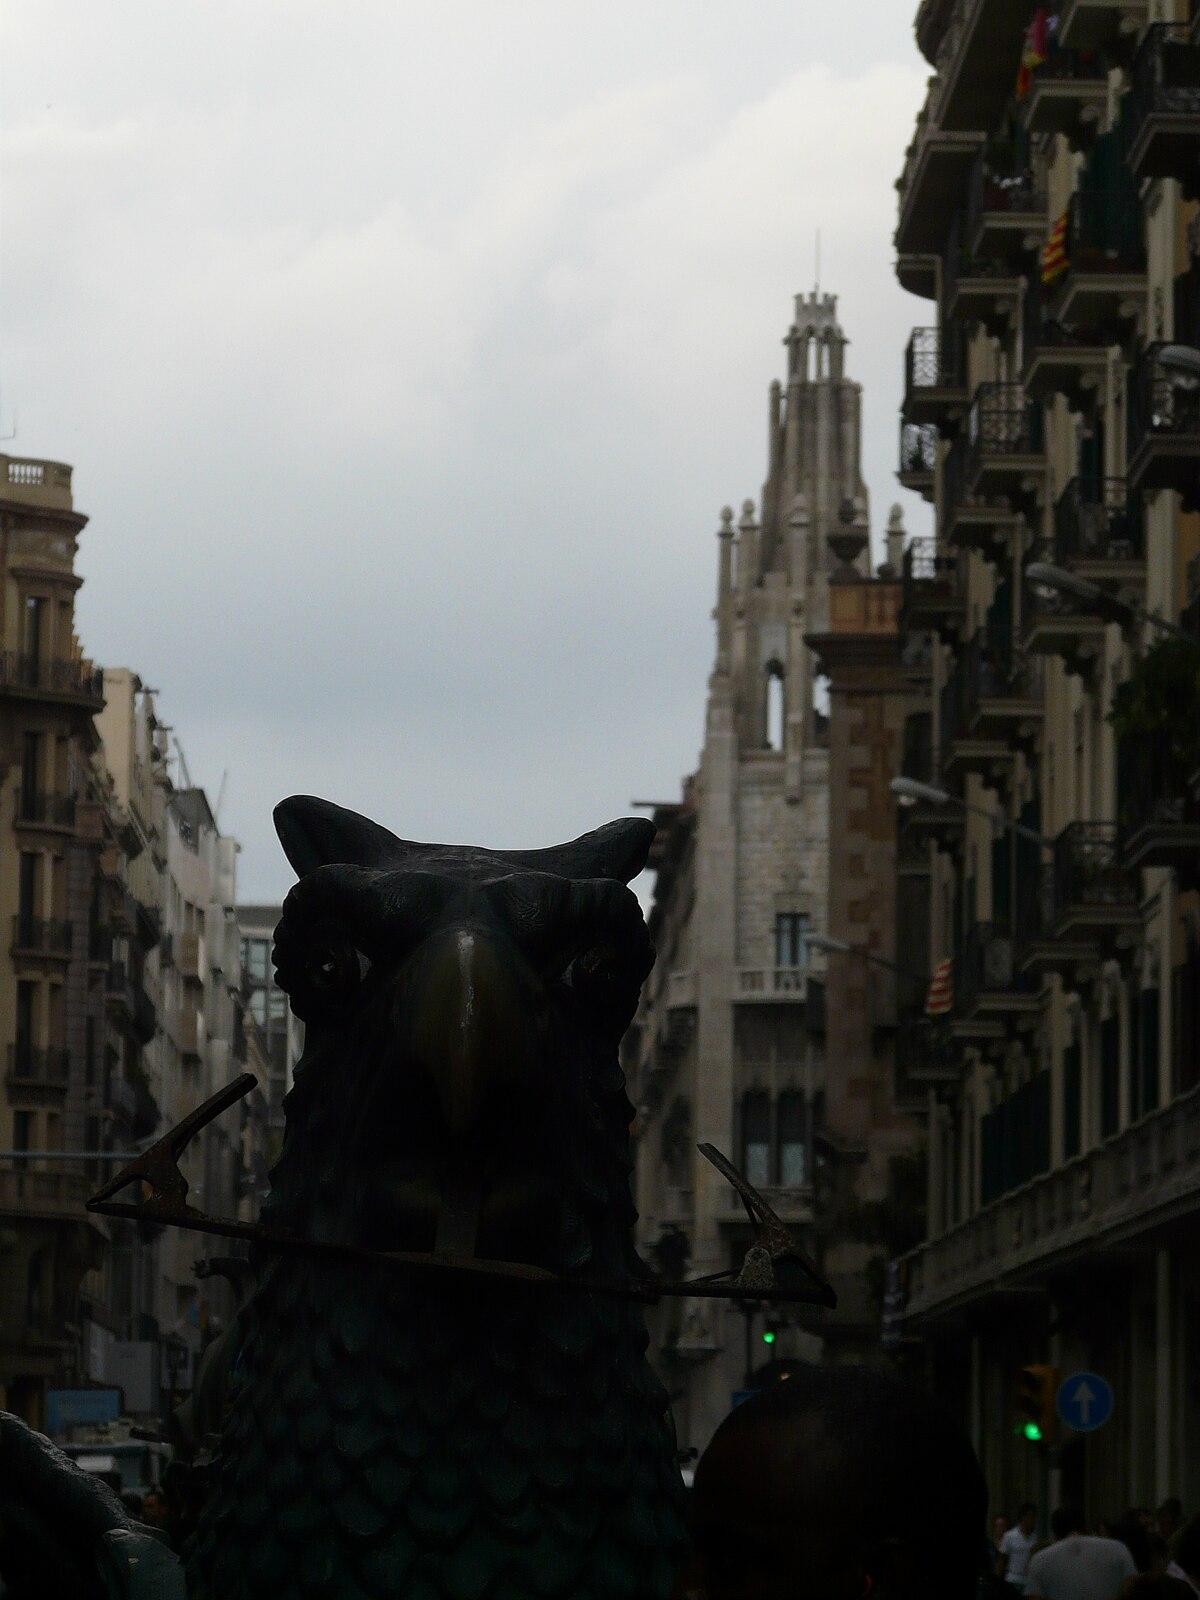 grifo de barcelona wikipedia la enciclopedia libre